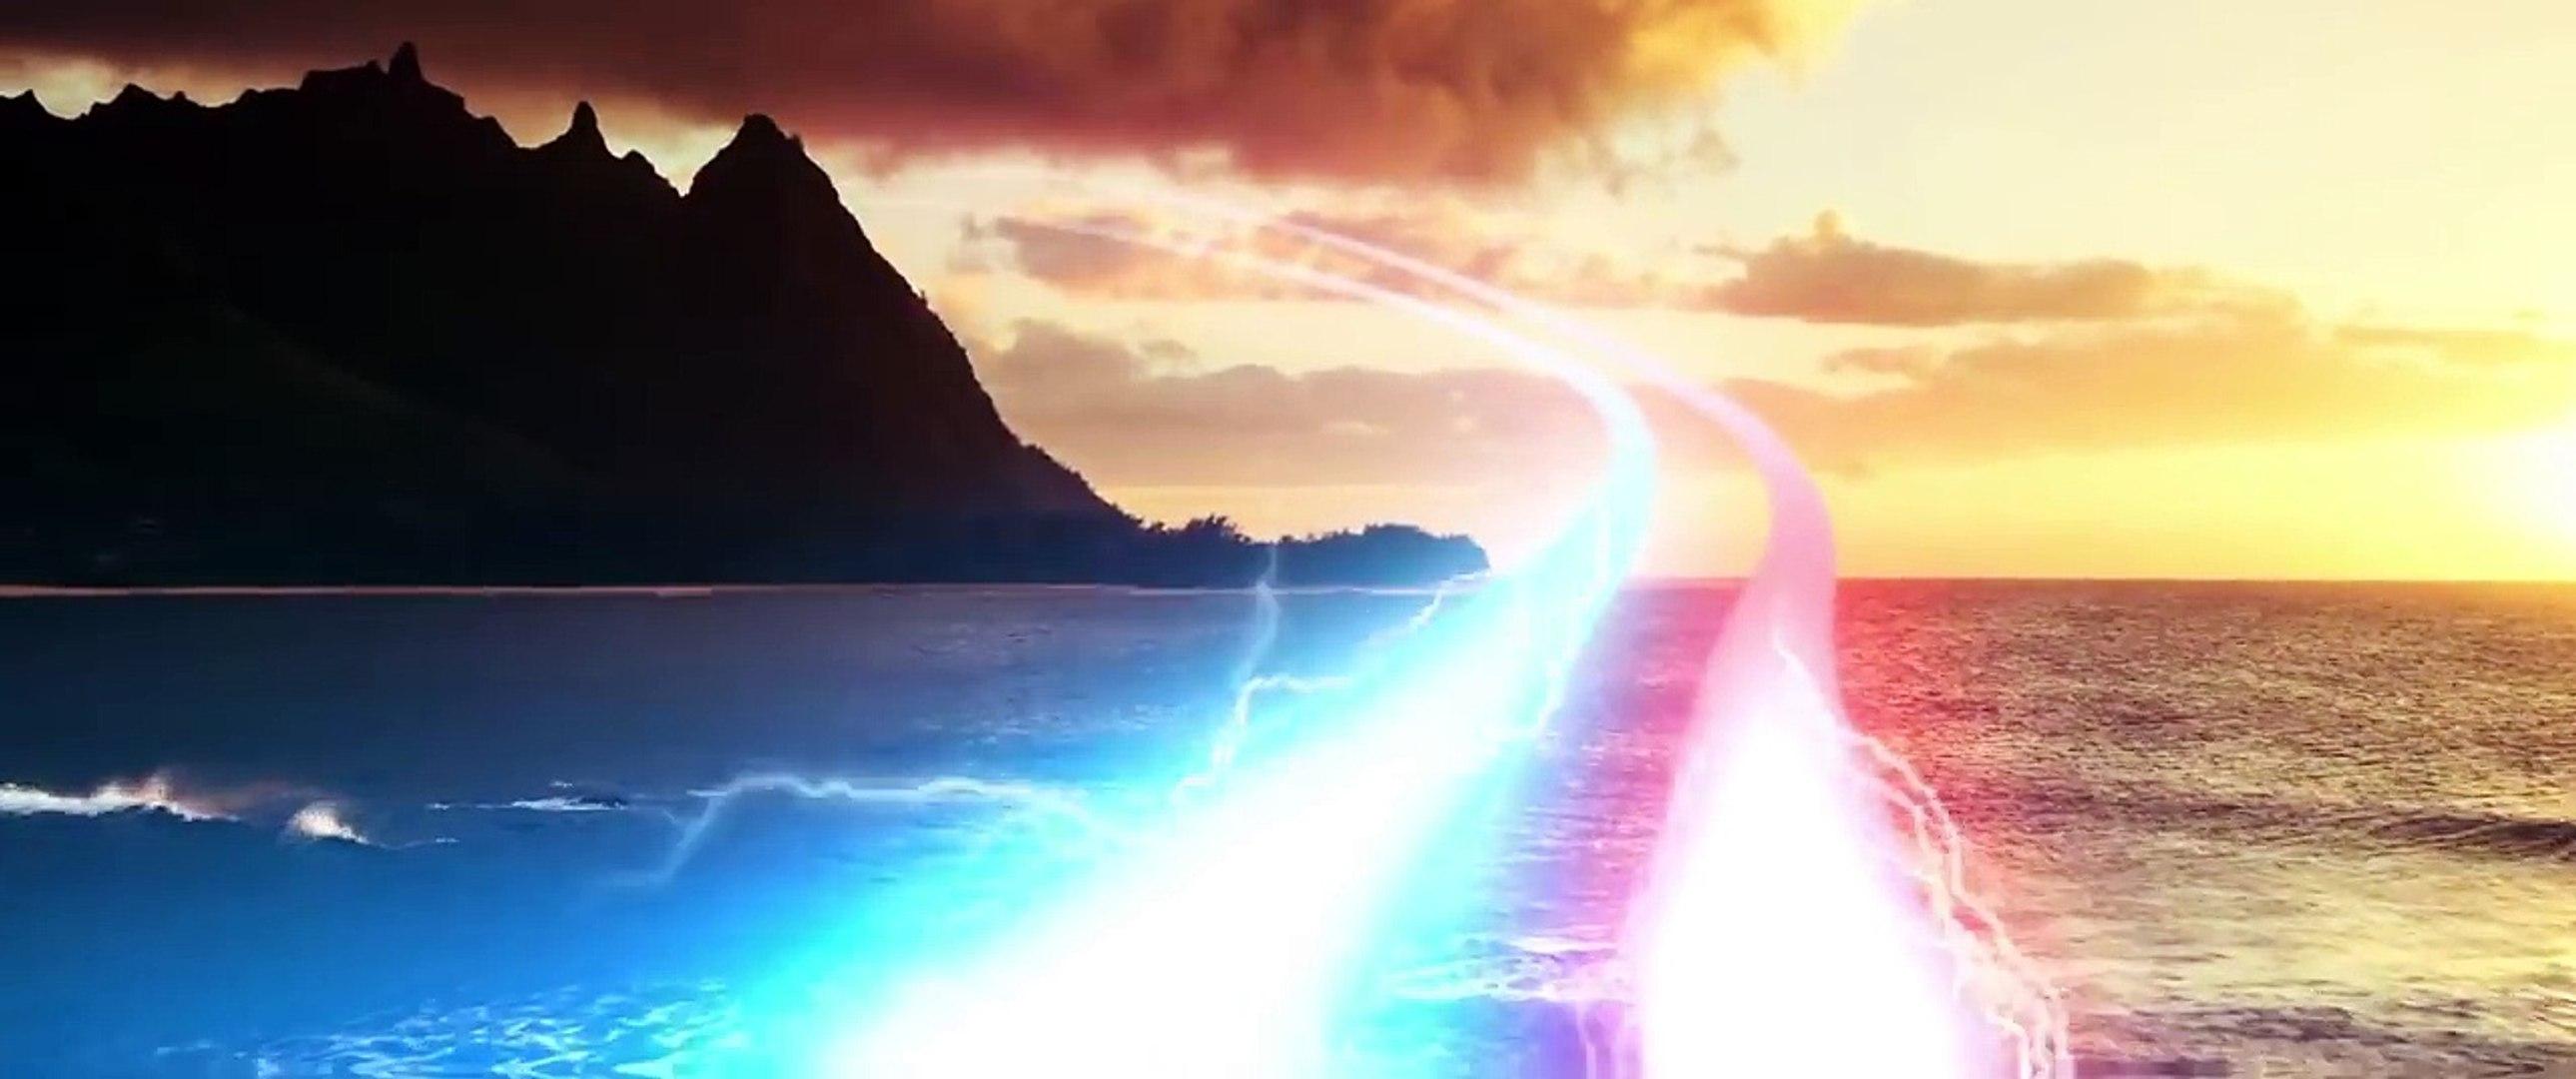 Power Rangers X Street Fighter - Court métrage Power Rangers Legacy Wars